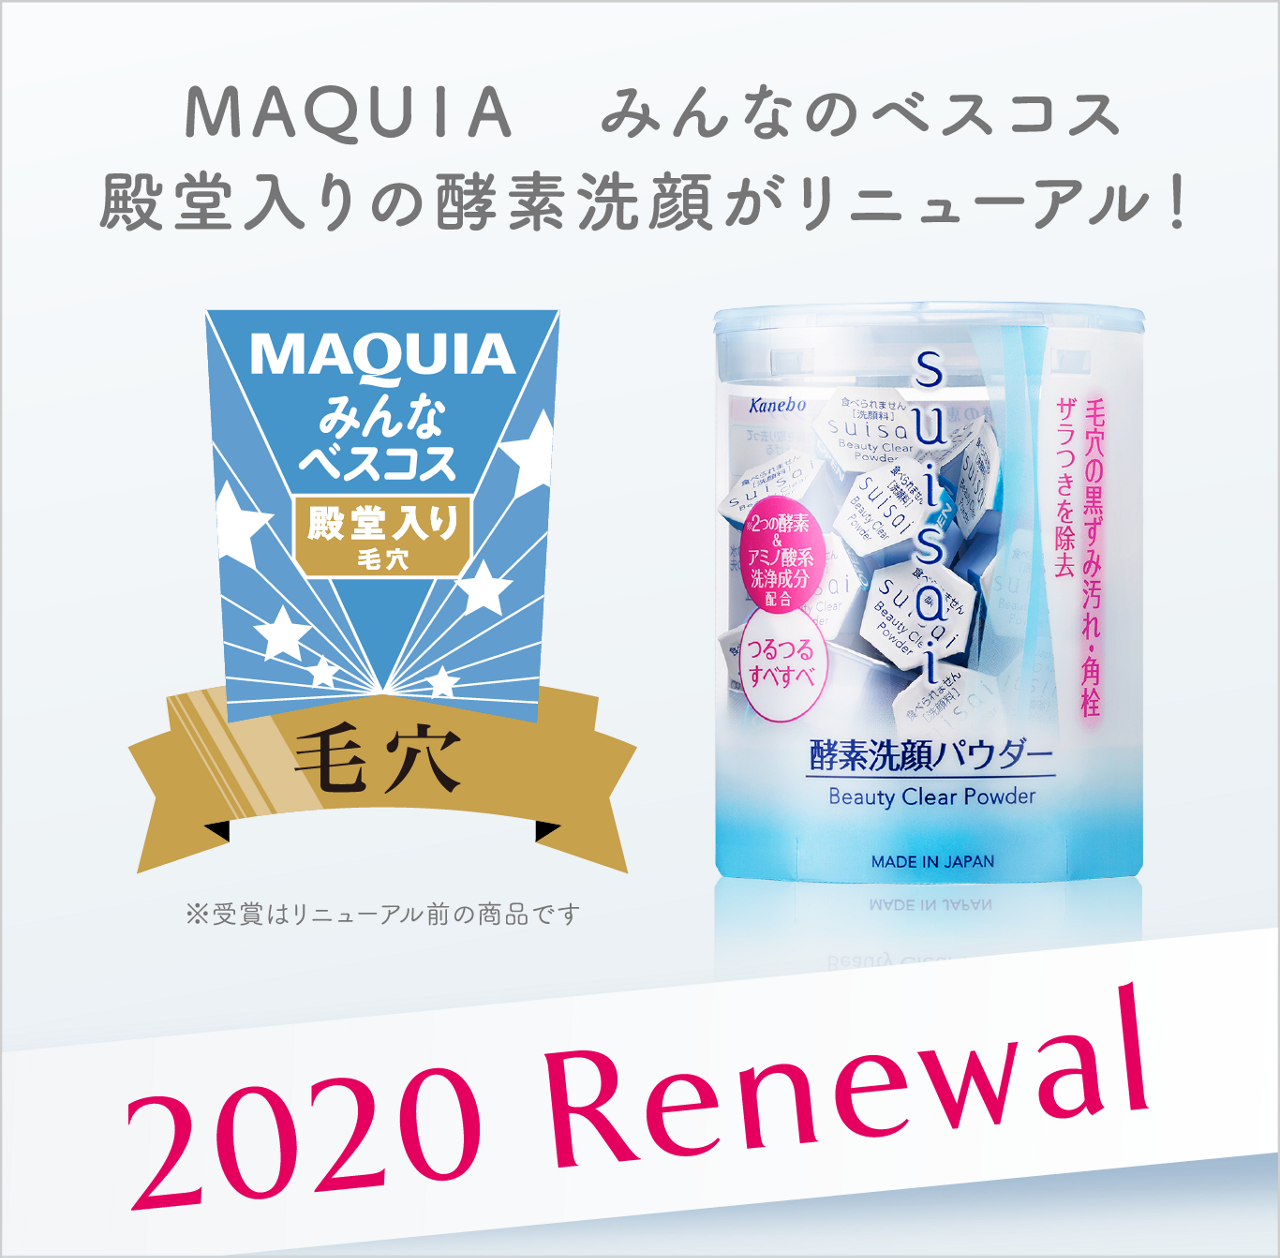 MAQUIA みんなのベスコス  殿堂入りの酵素洗顔がリニューアル! ※受賞はリニューアル前の商品です 2020 Renewal